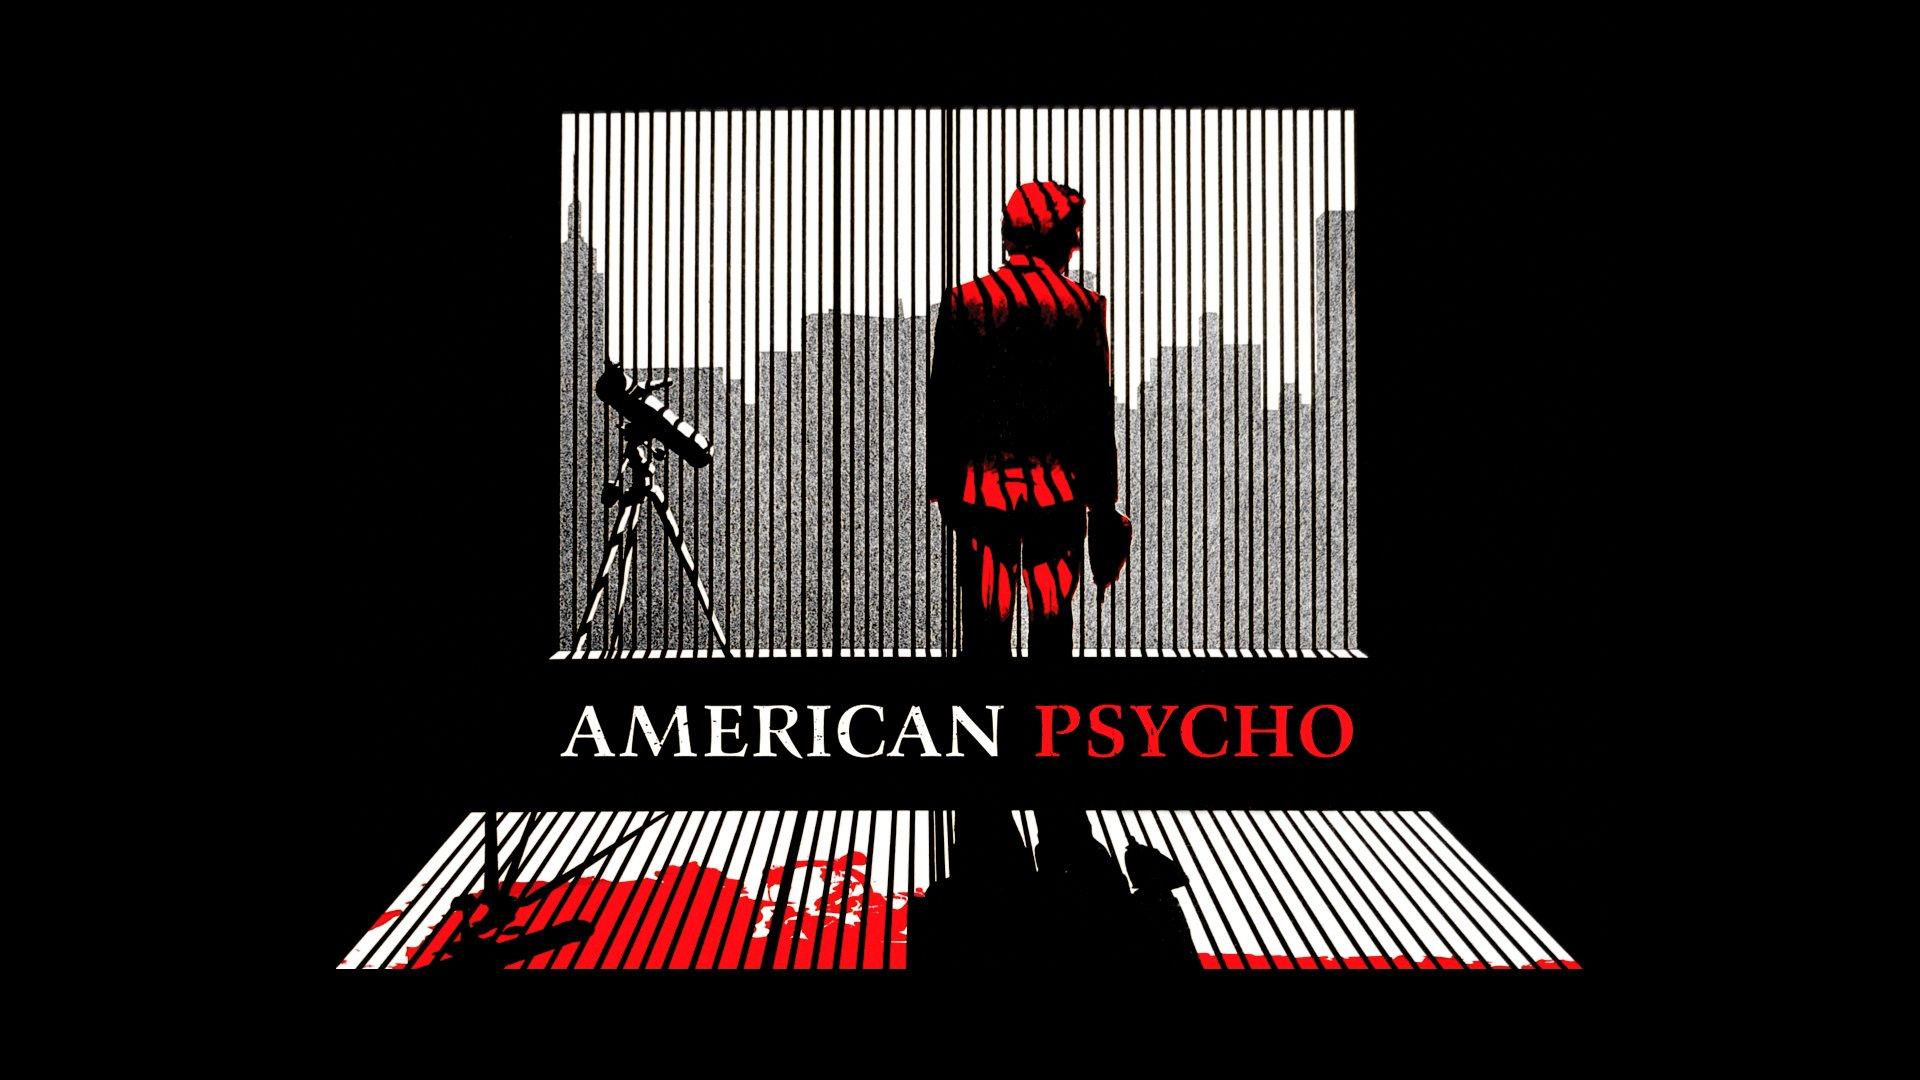 American psycho wallpaper 1920x1080 426377 WallpaperUP 1920x1080